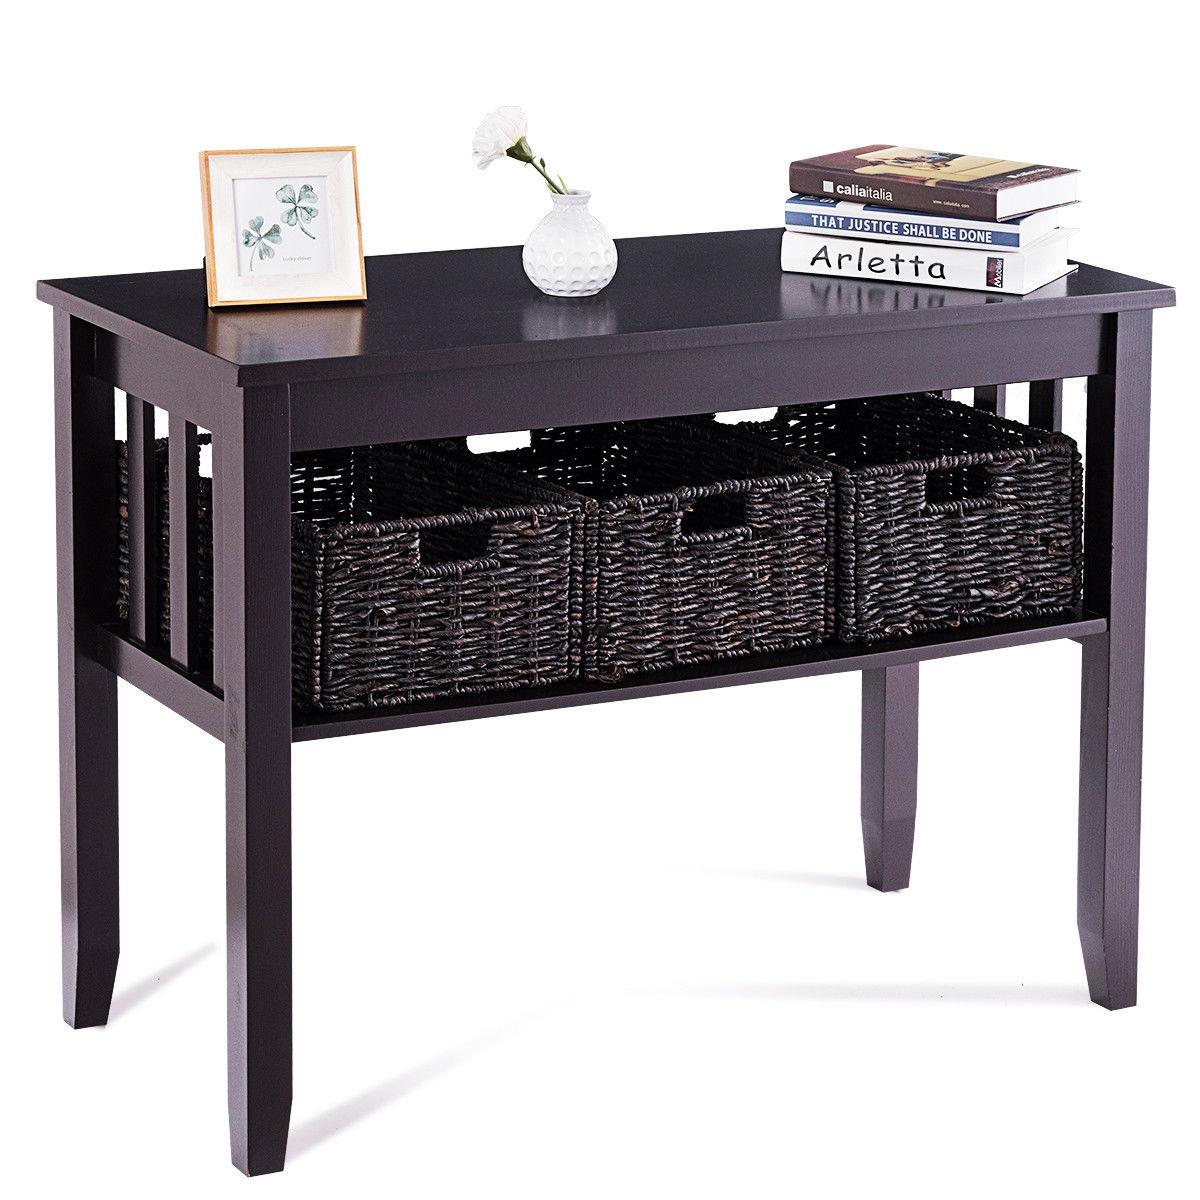 Wooden Rectangular Side Storage Table with 3 Storage Baskets